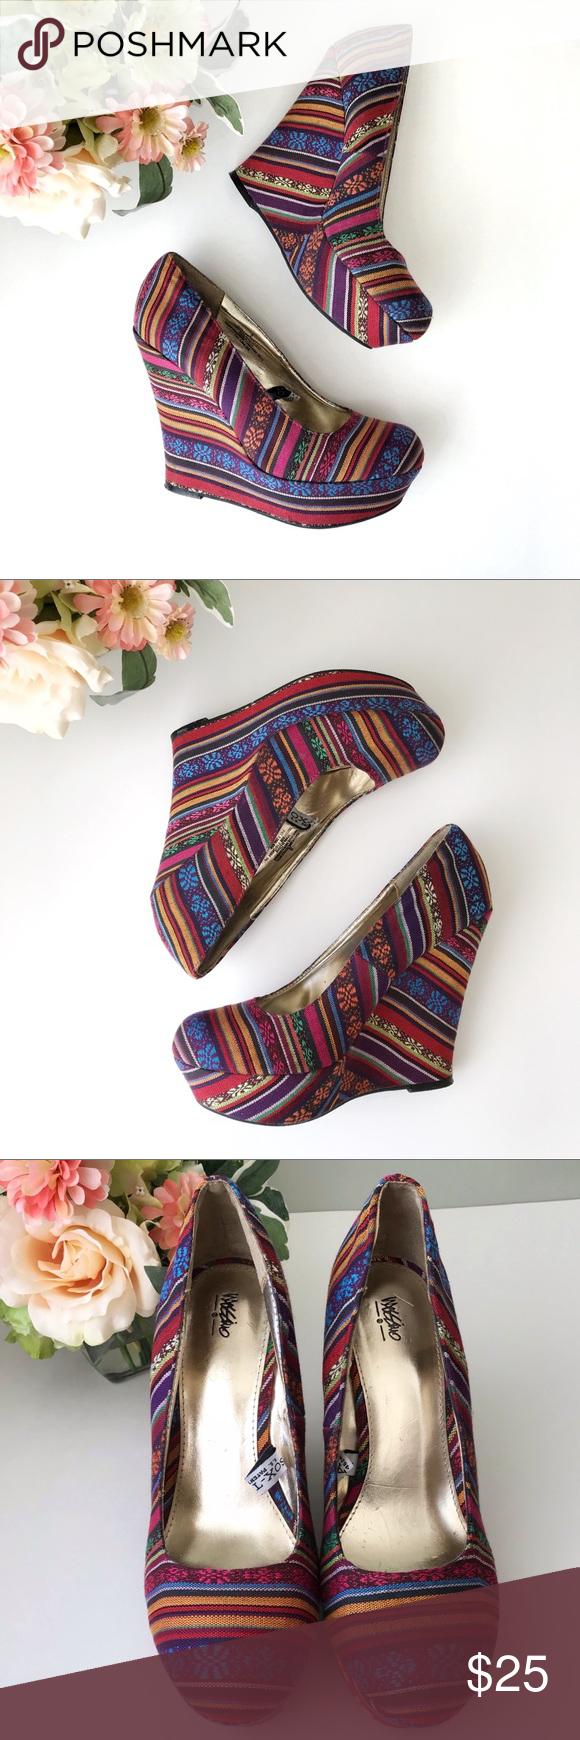 Colorful Fiesta Mossimo wedge platform heels * Colorful Mossimo wedge platform h…